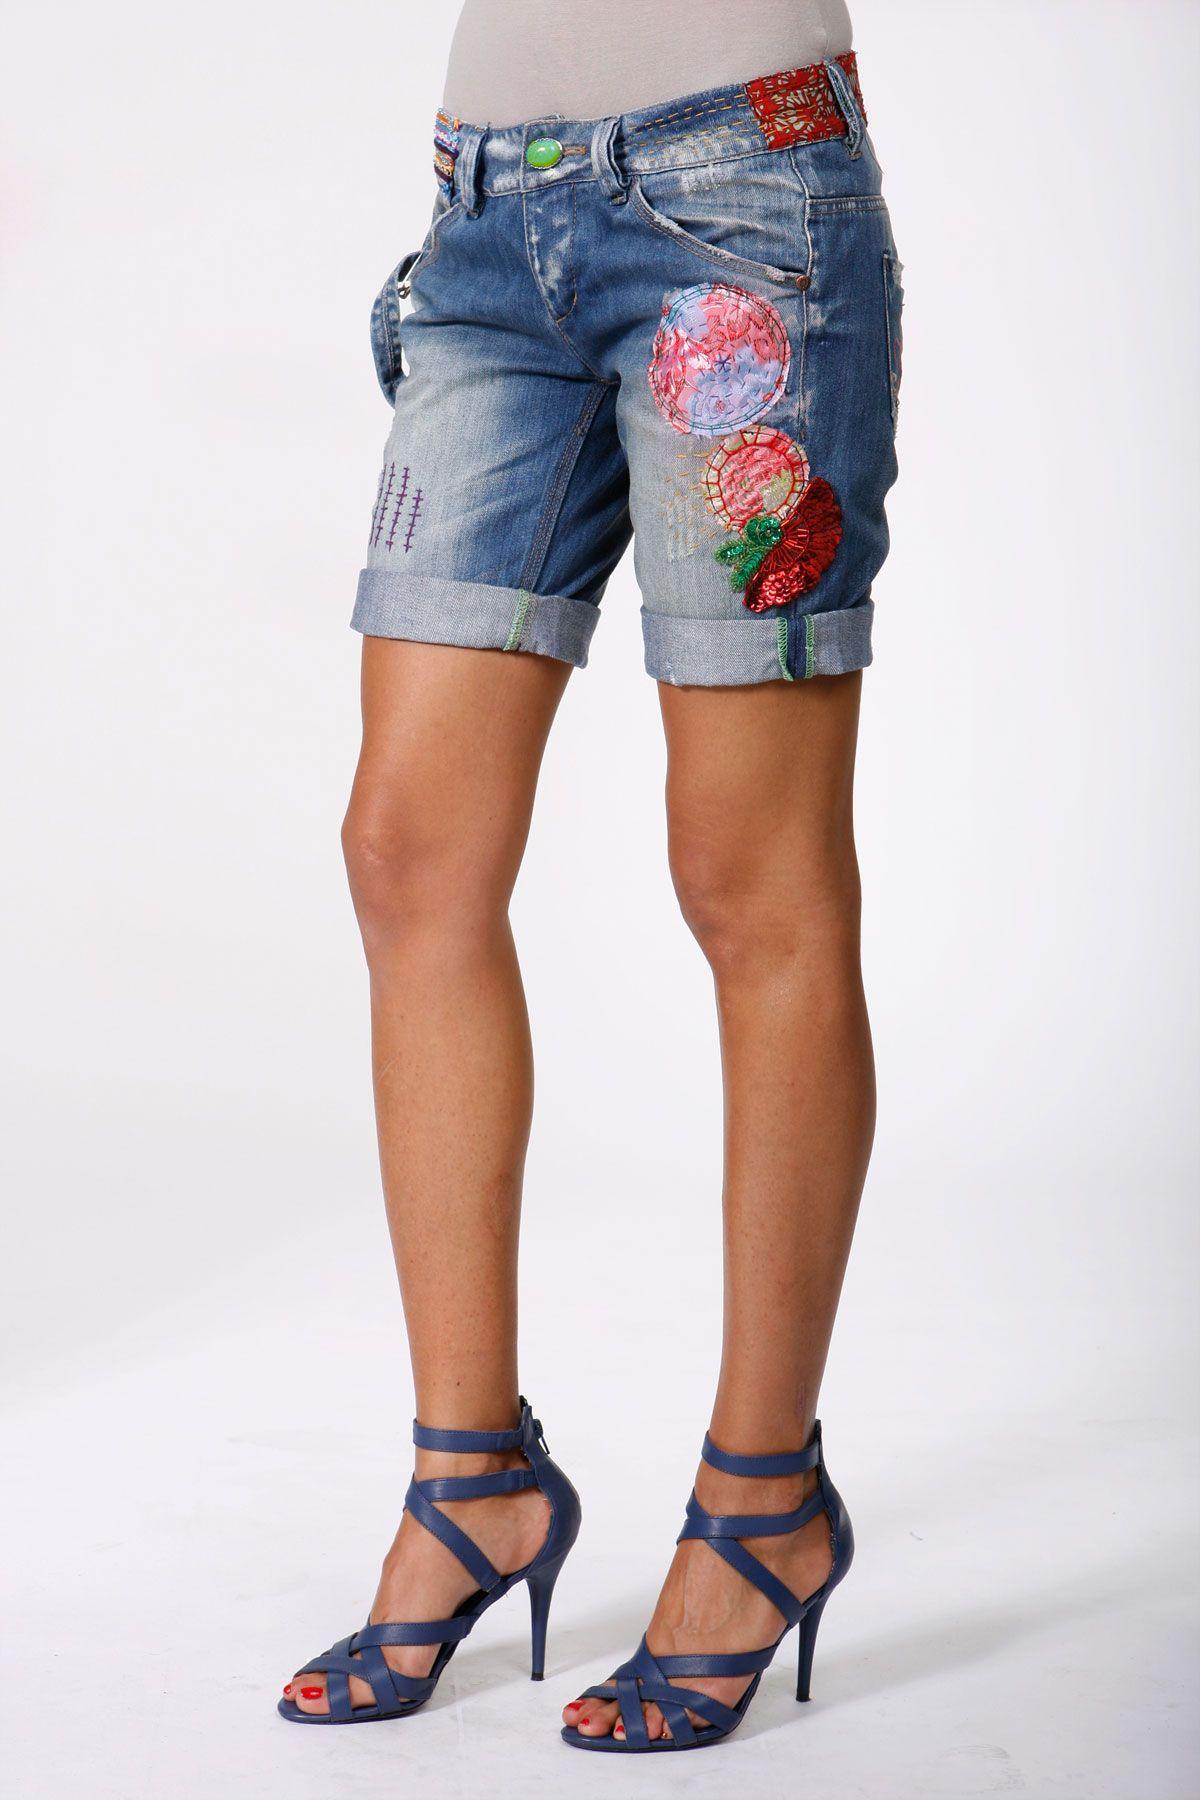 Desigual jeans shorts Sicilia M or L | Mode